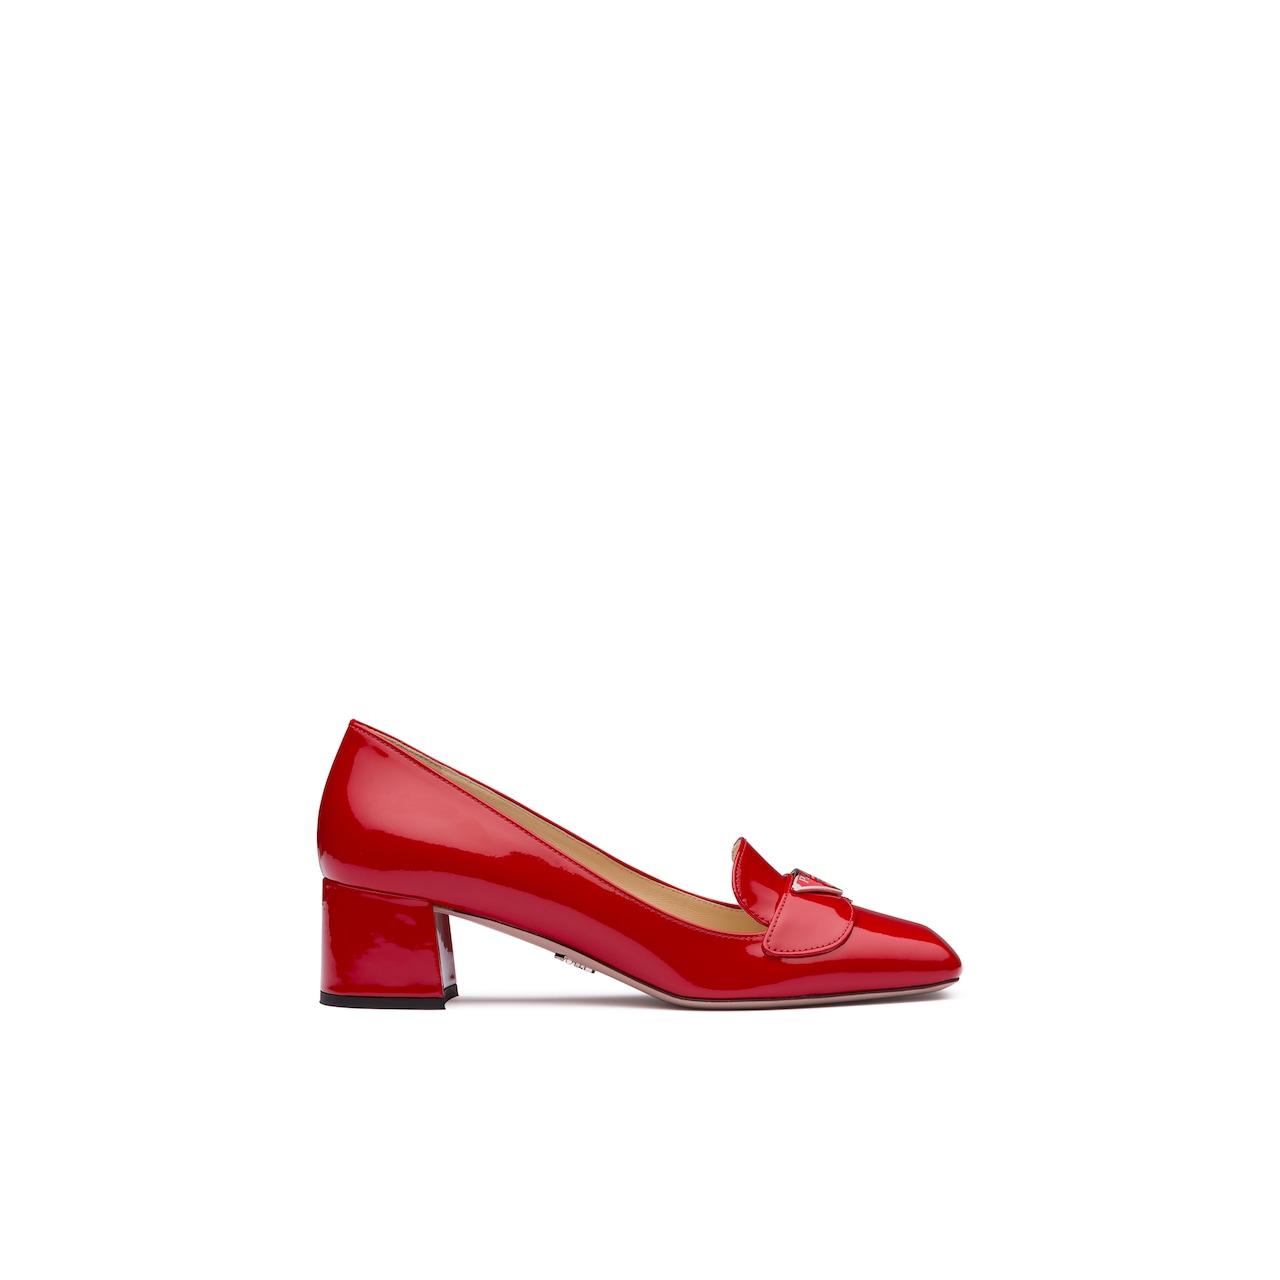 Prada 漆皮乐福鞋 2